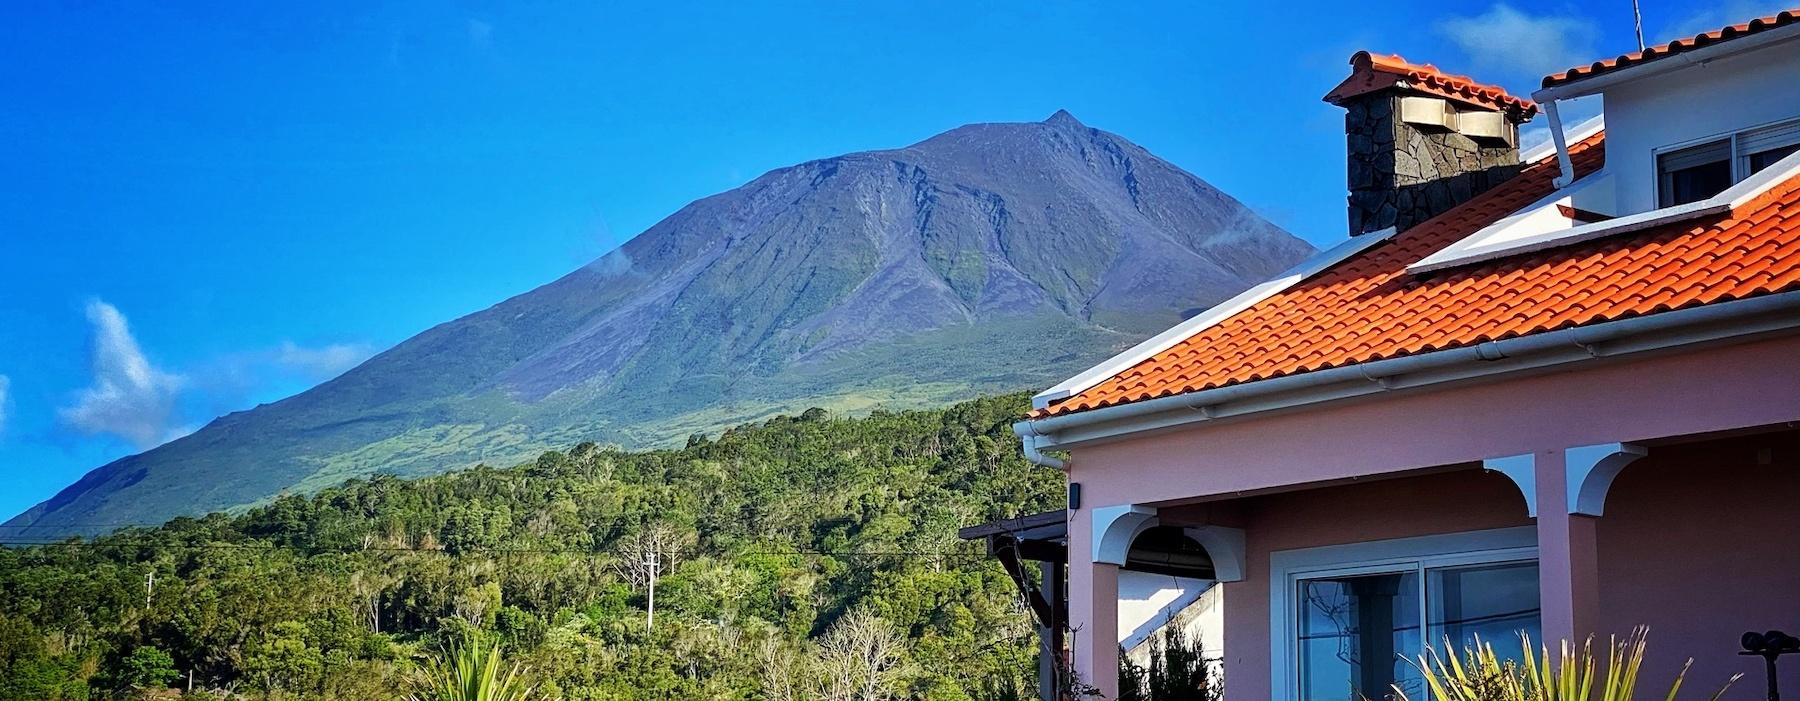 Miradouro Da Papalva and the Majestic Pico Mountain